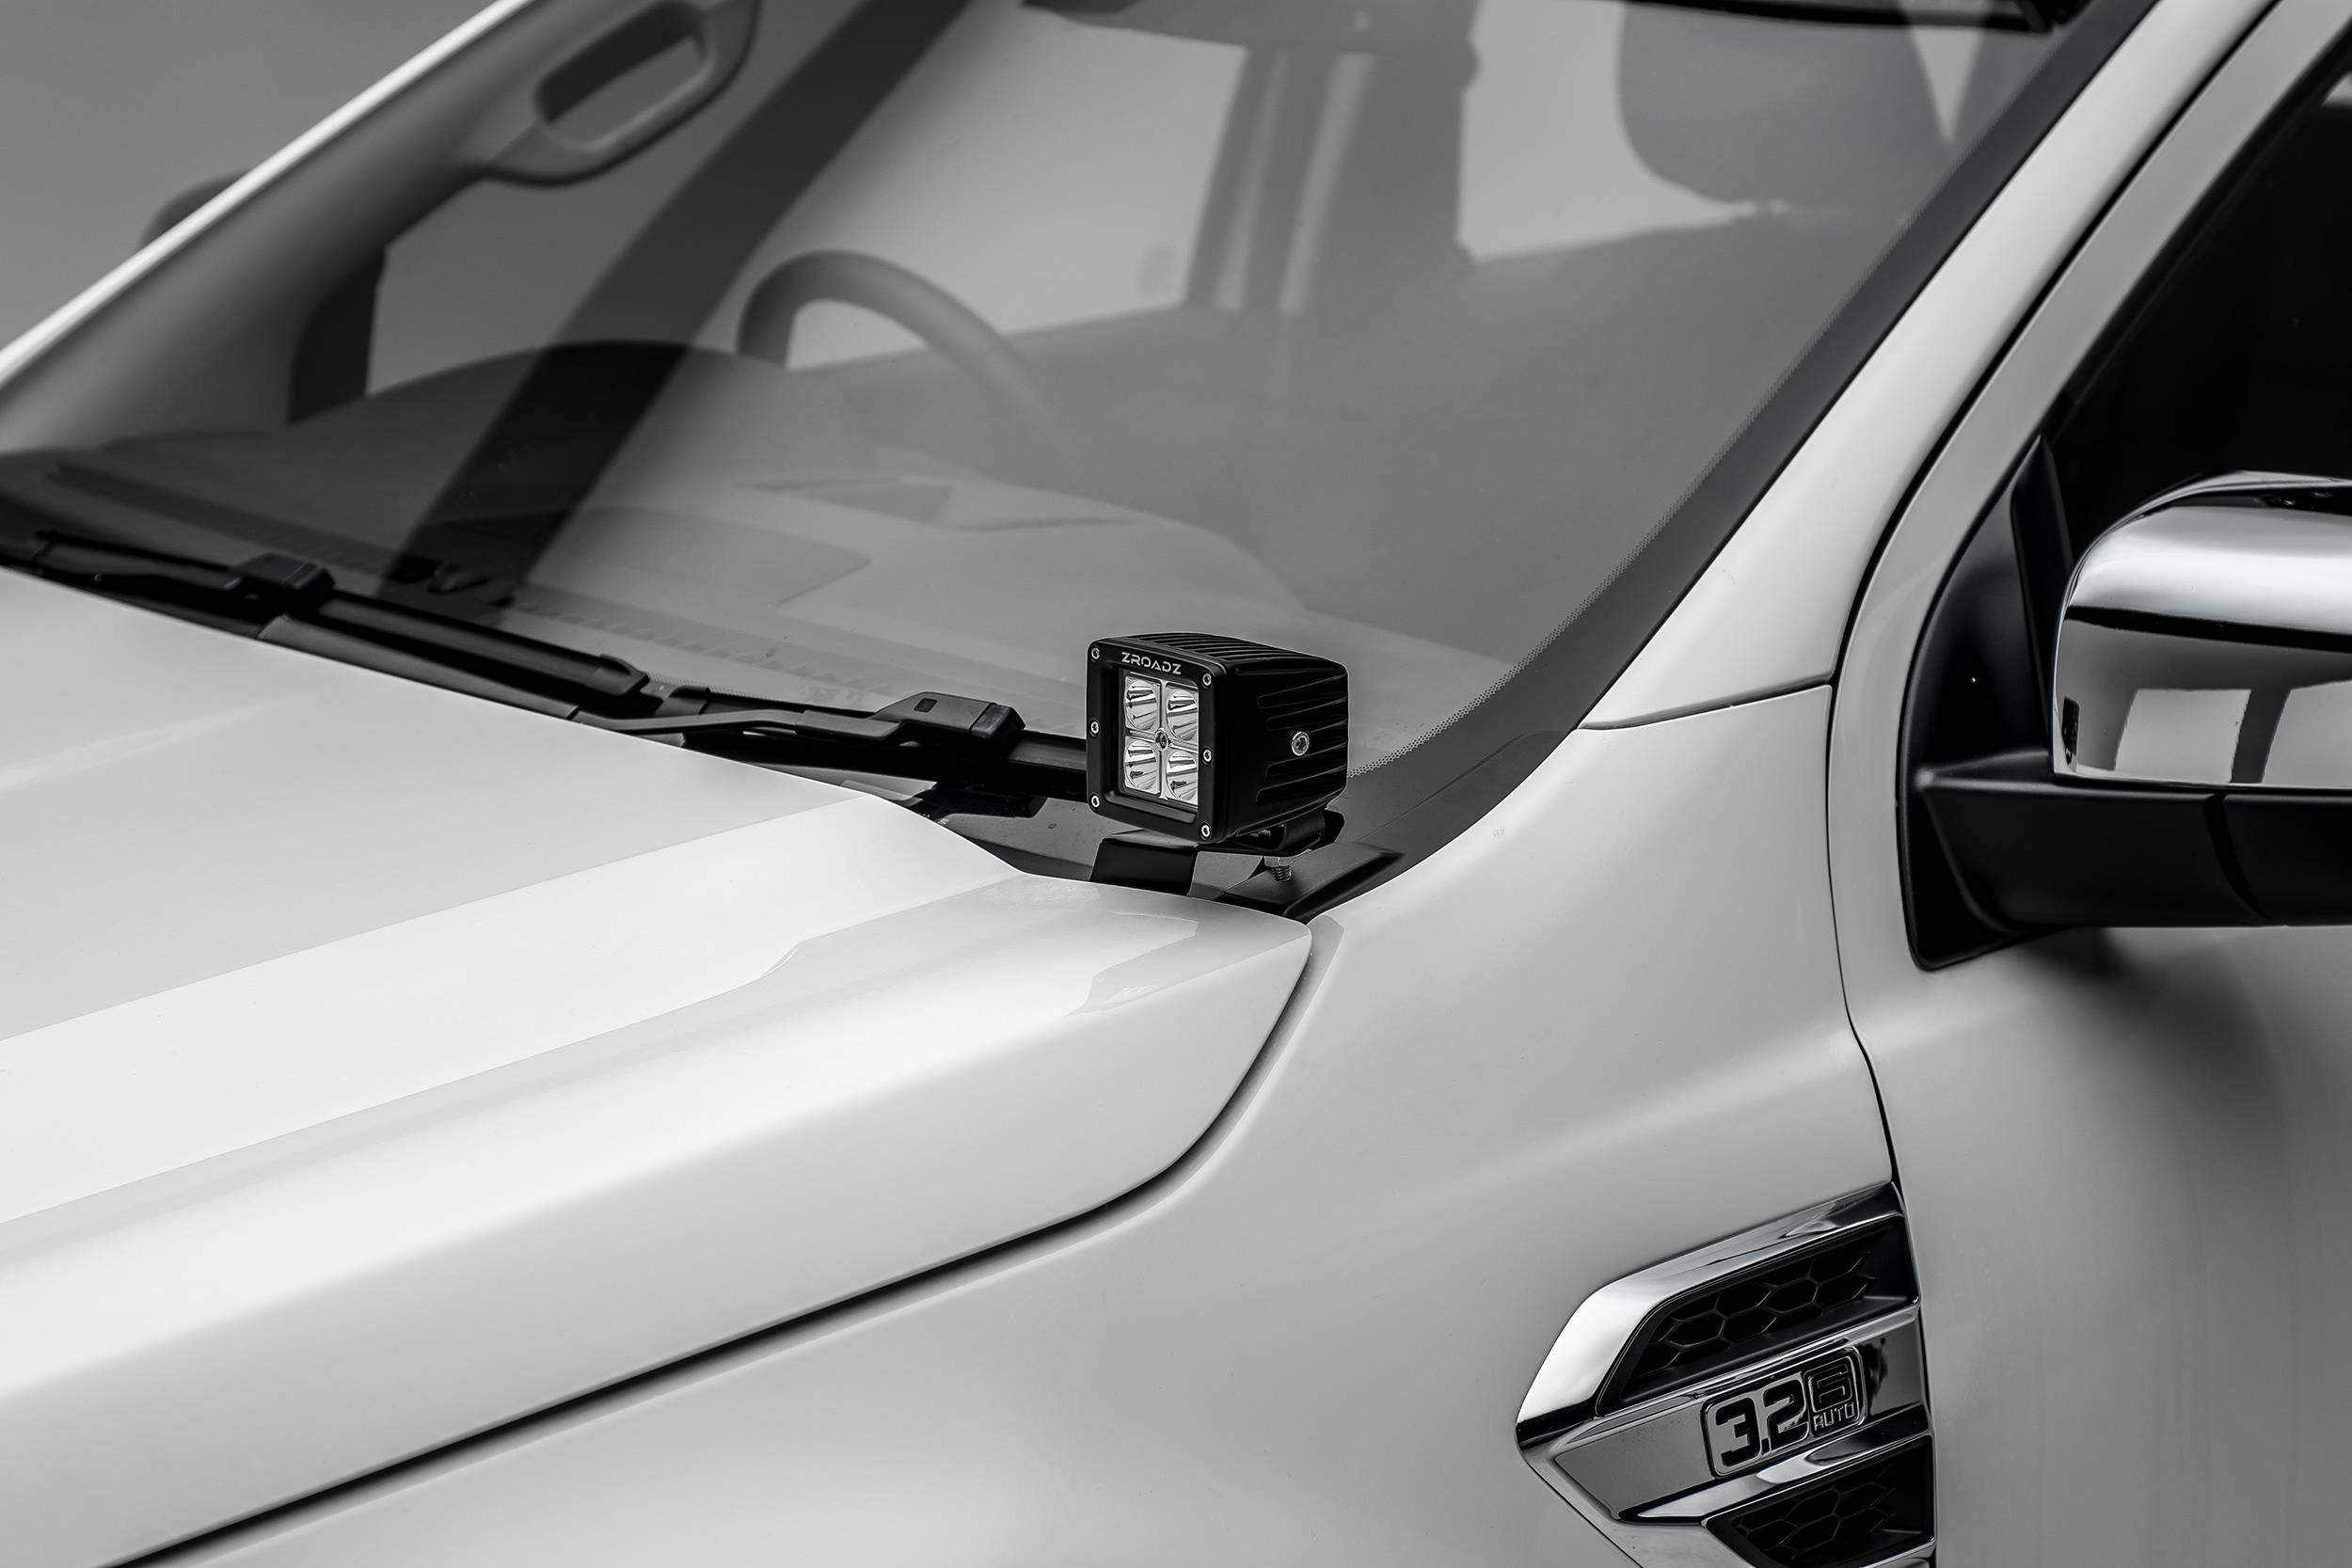 ZROADZ OFF ROAD PRODUCTS - 2015-2018 Ford Ranger T6 Hood Hinge LED Kit with (2) 3 Inch LED Pod Lights - PN #Z365761-KIT2